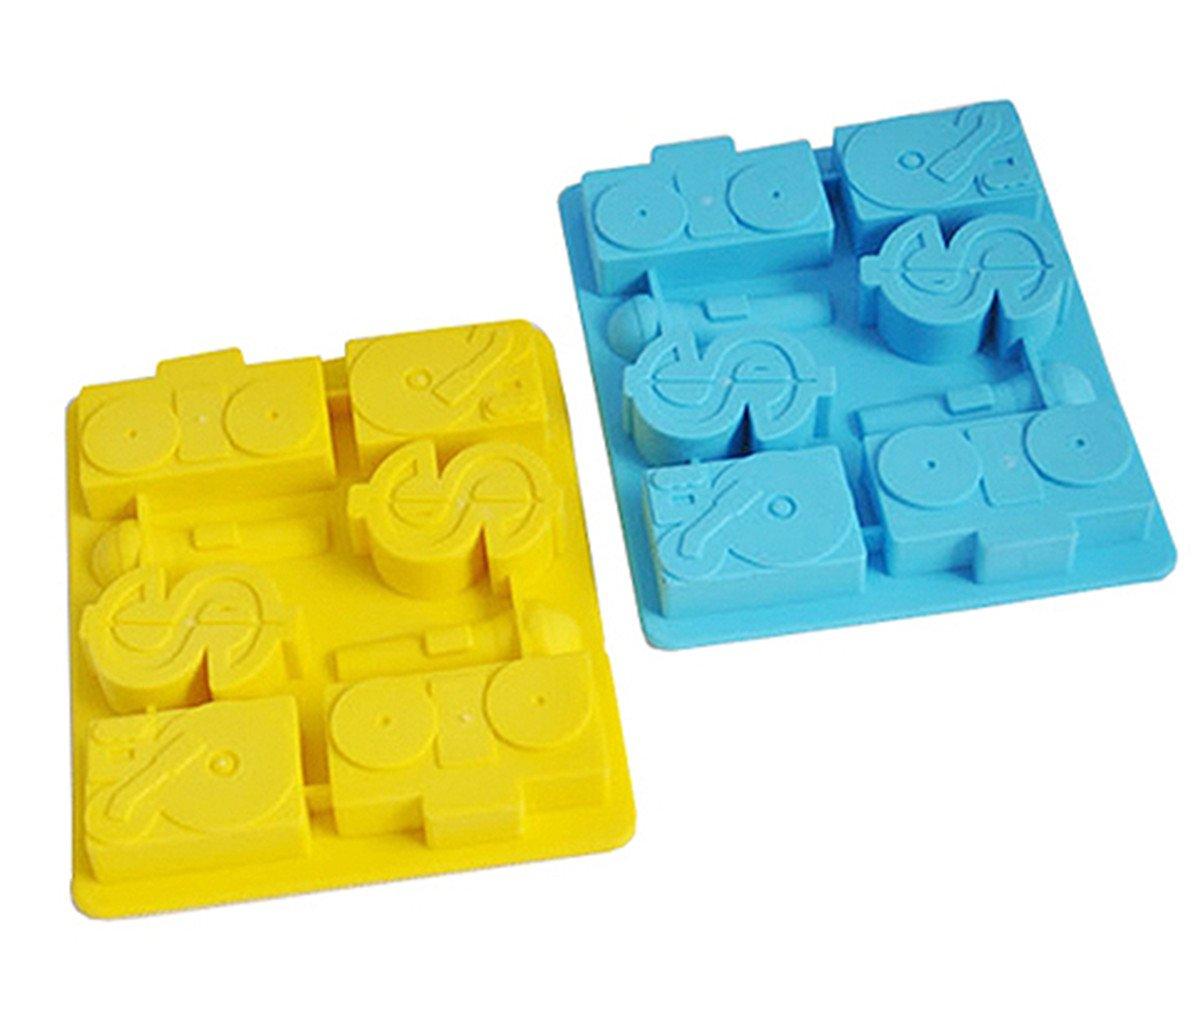 2-Pack of Star Wars Death Star Silicone Ice Molds Kotobukiya GZ317